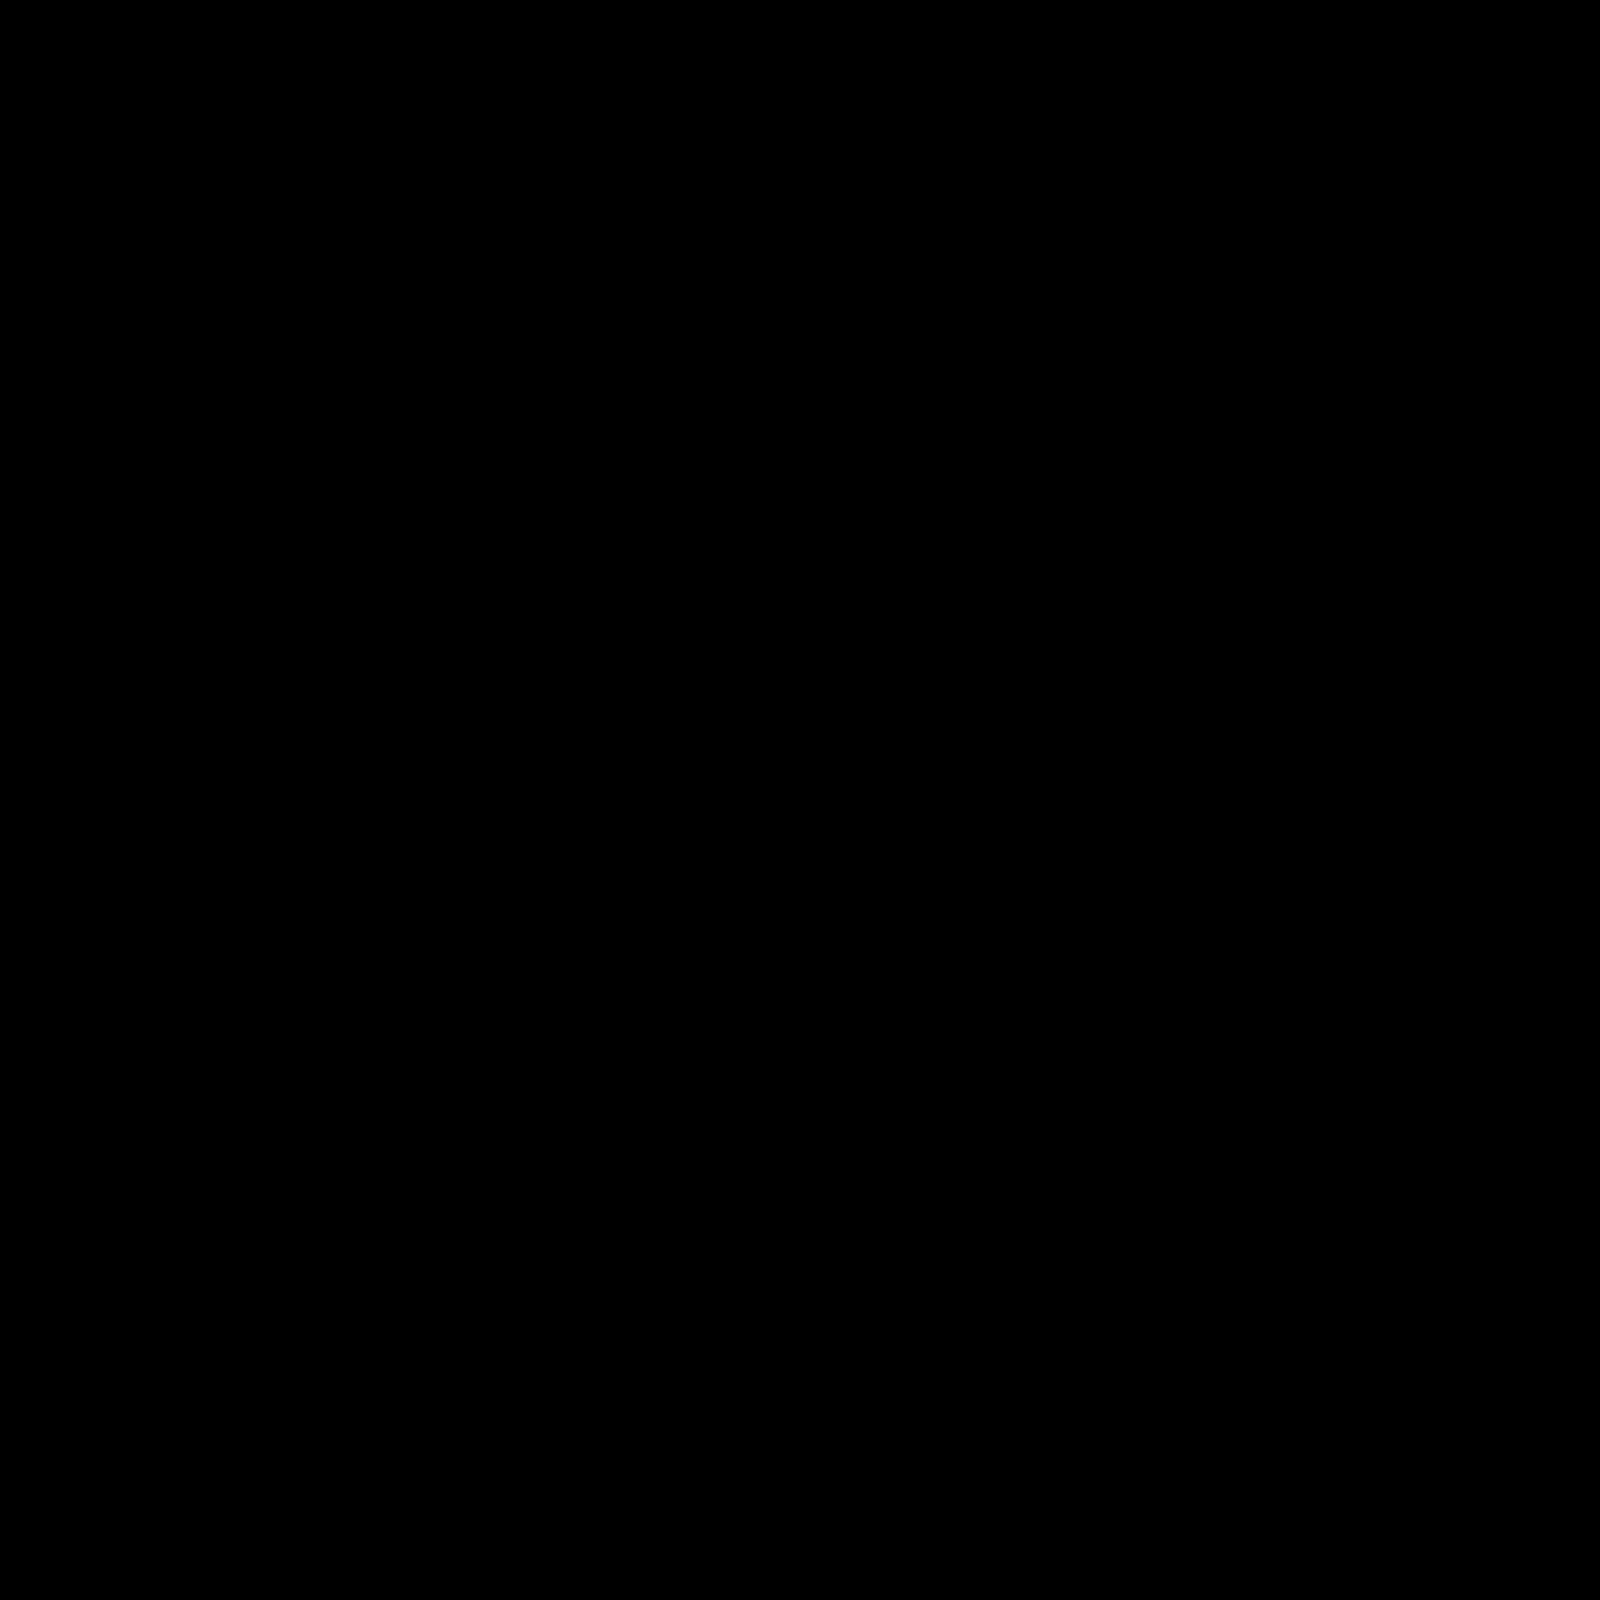 Cambio icon